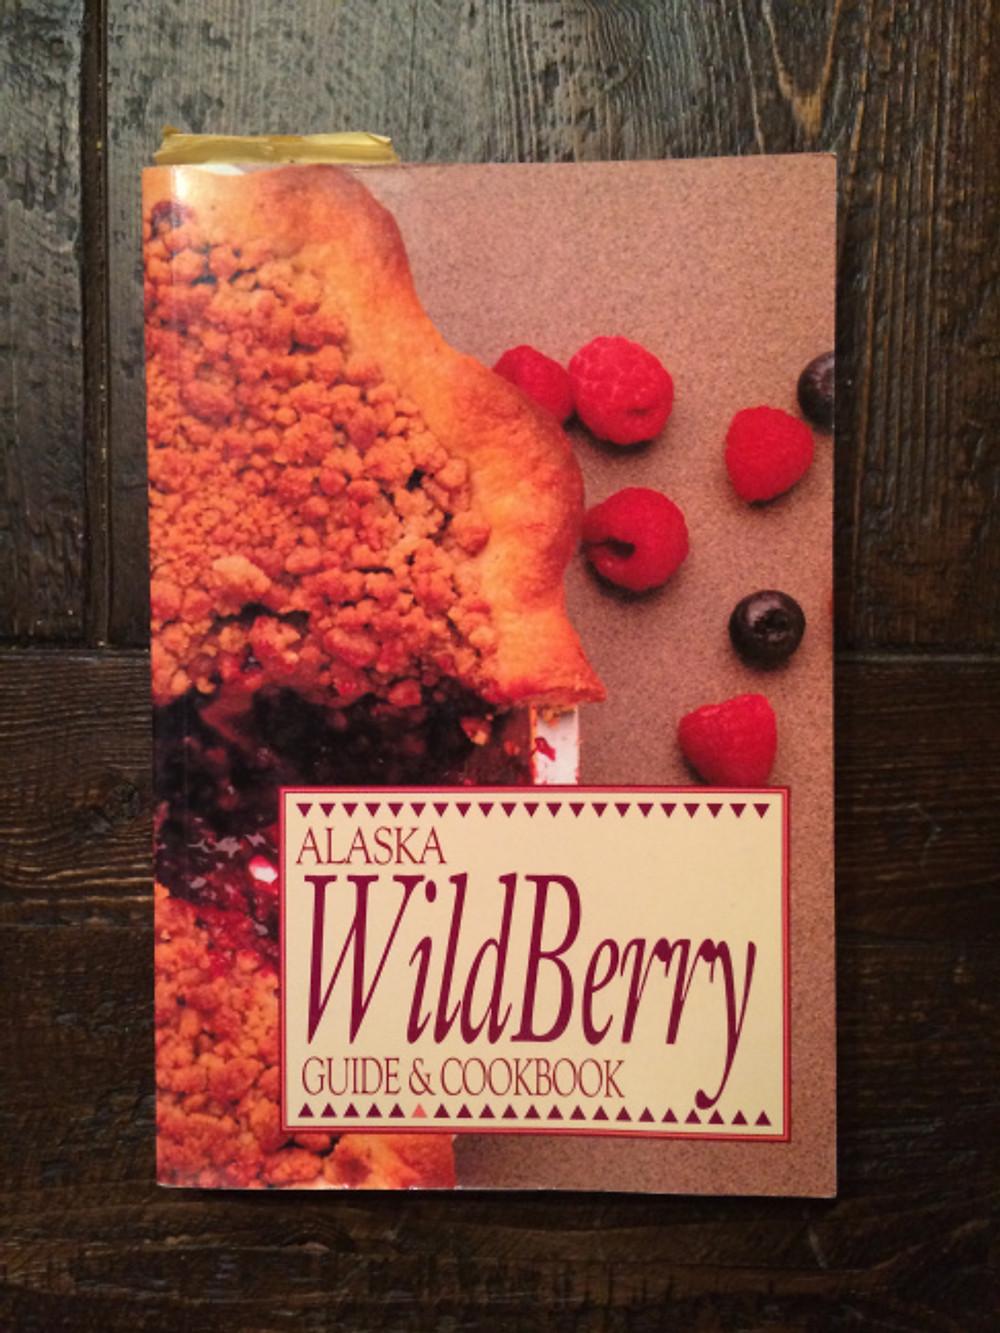 Alaska Wild Berry Cookbook